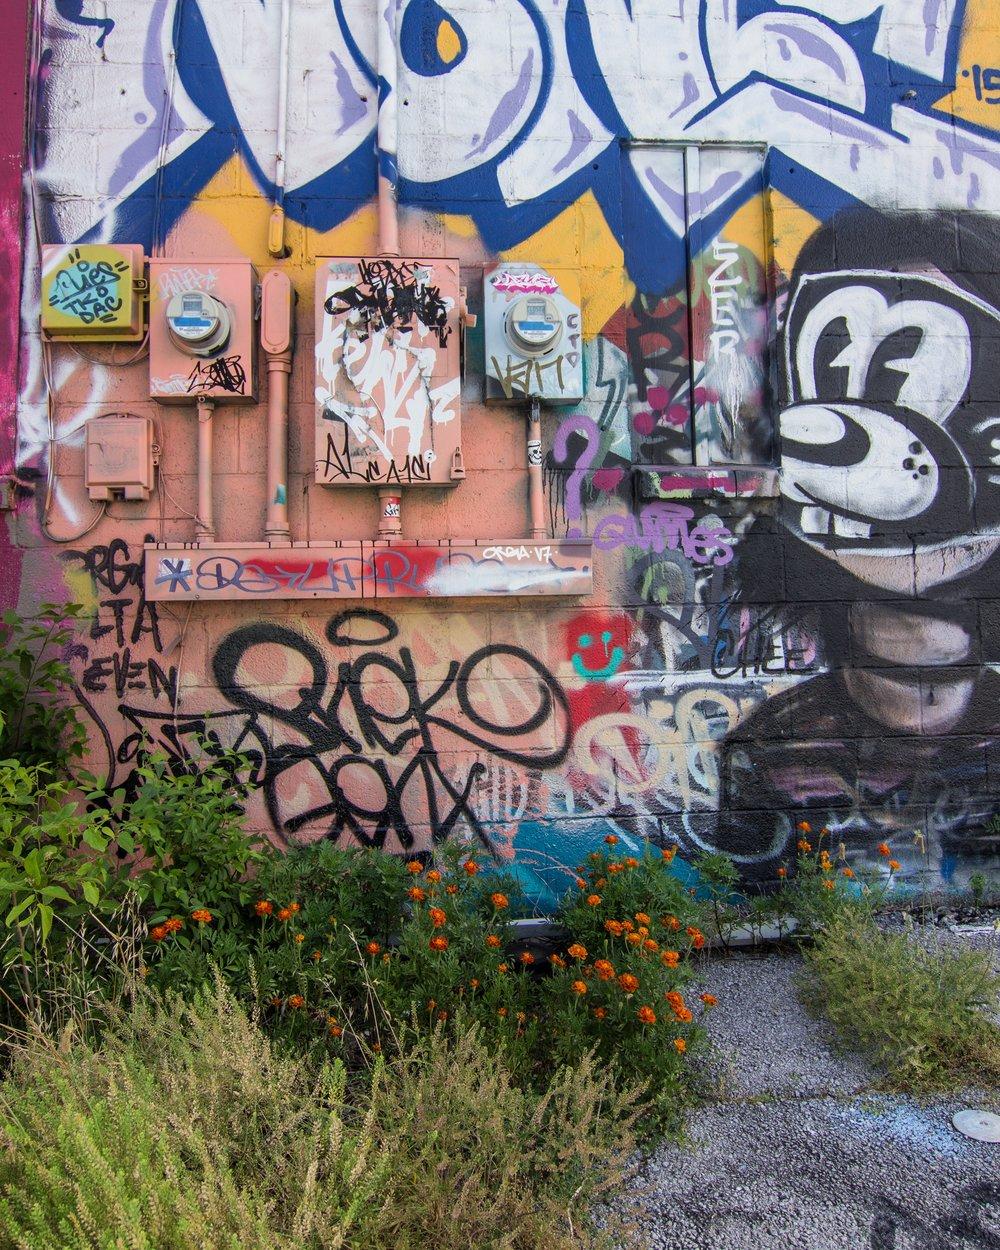 Micky Graffiti